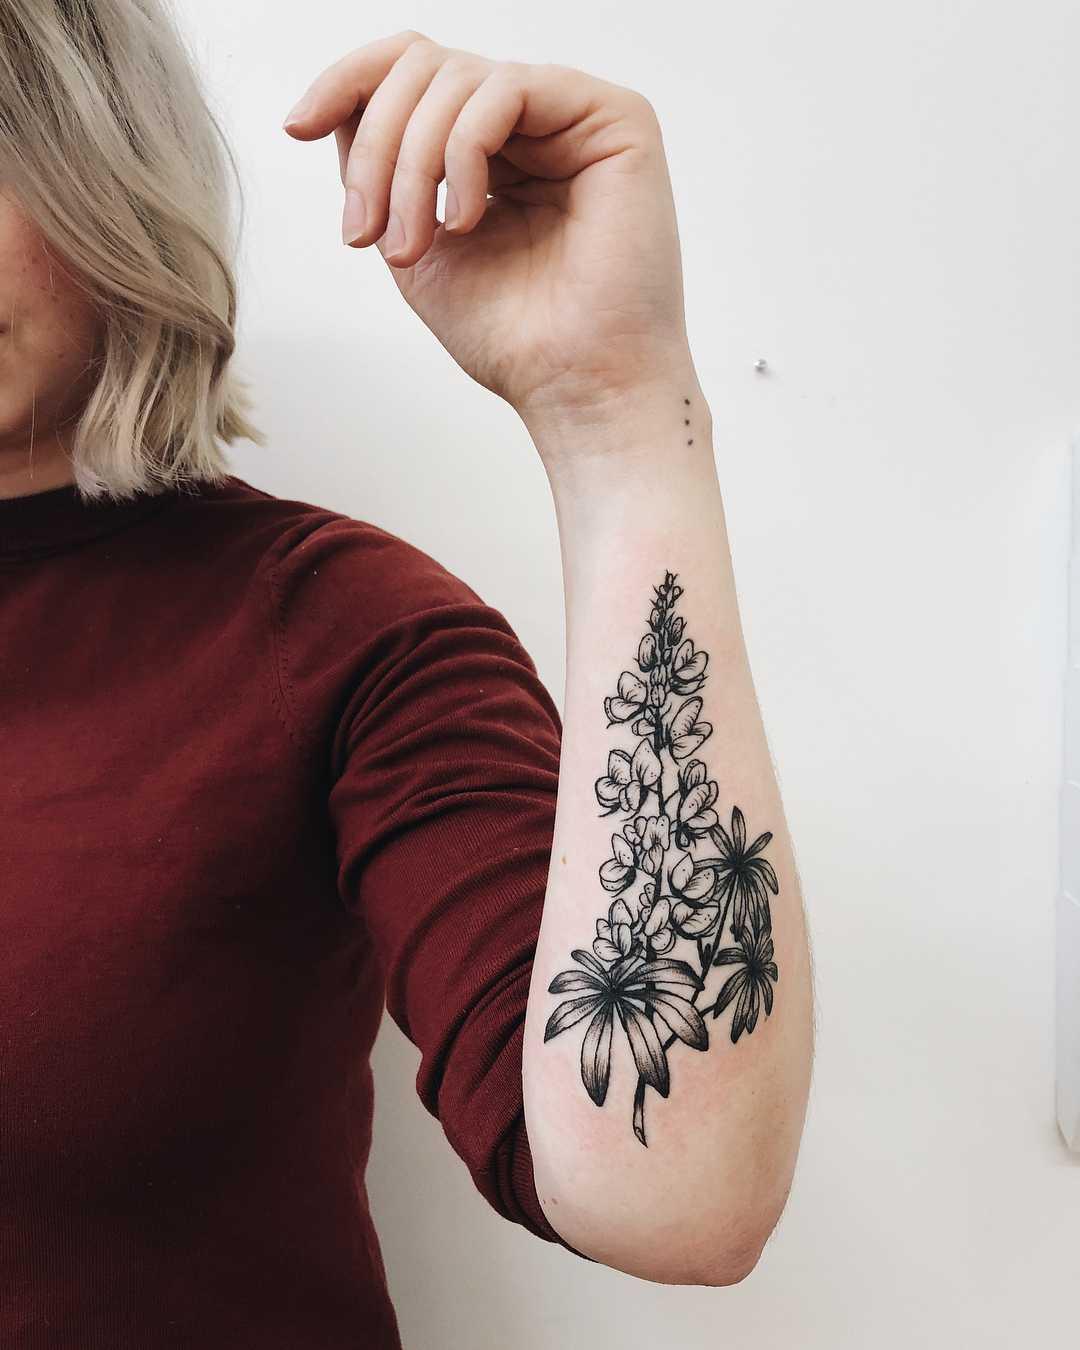 Texas bluebonnet tattoo